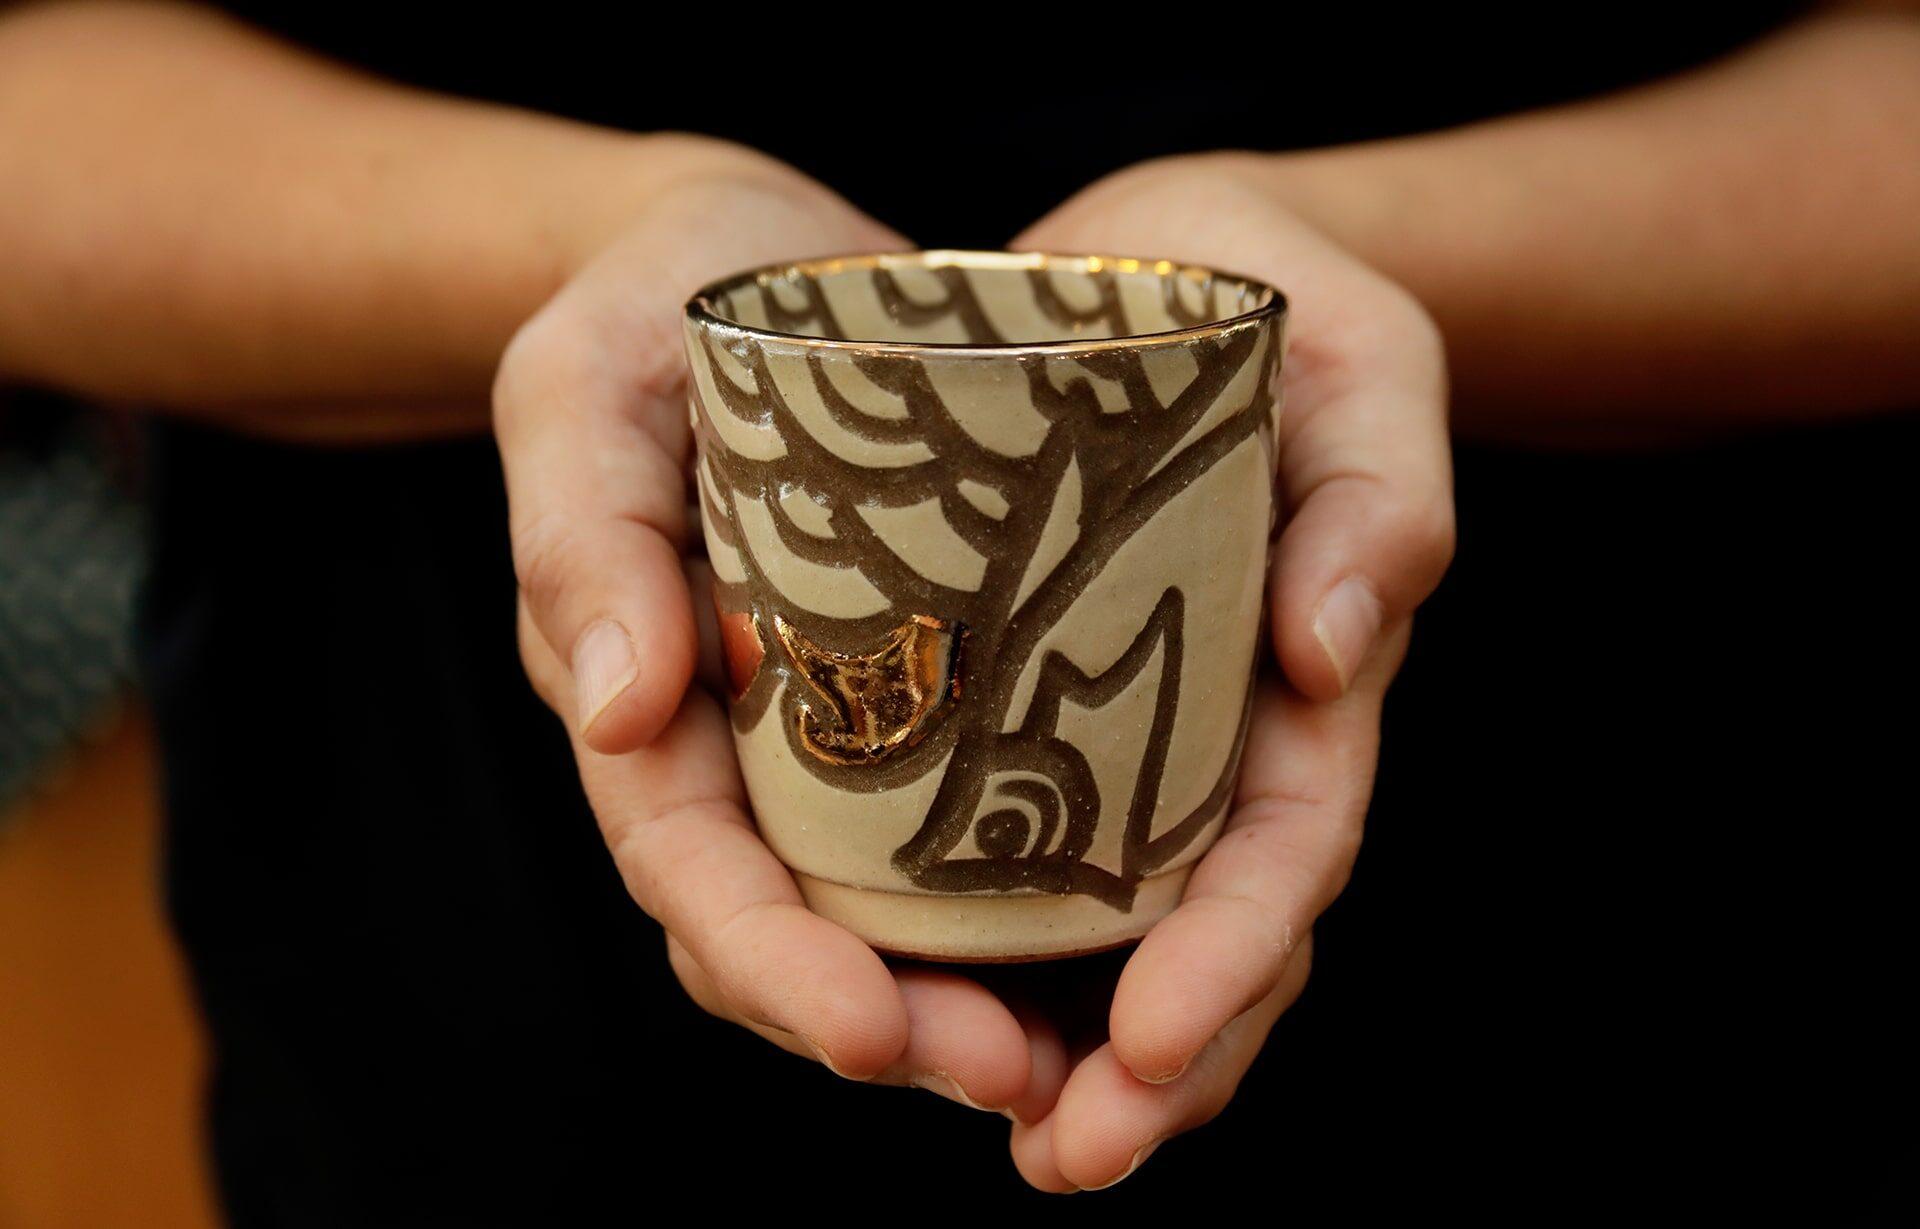 清正陶器壺屋窯の作品